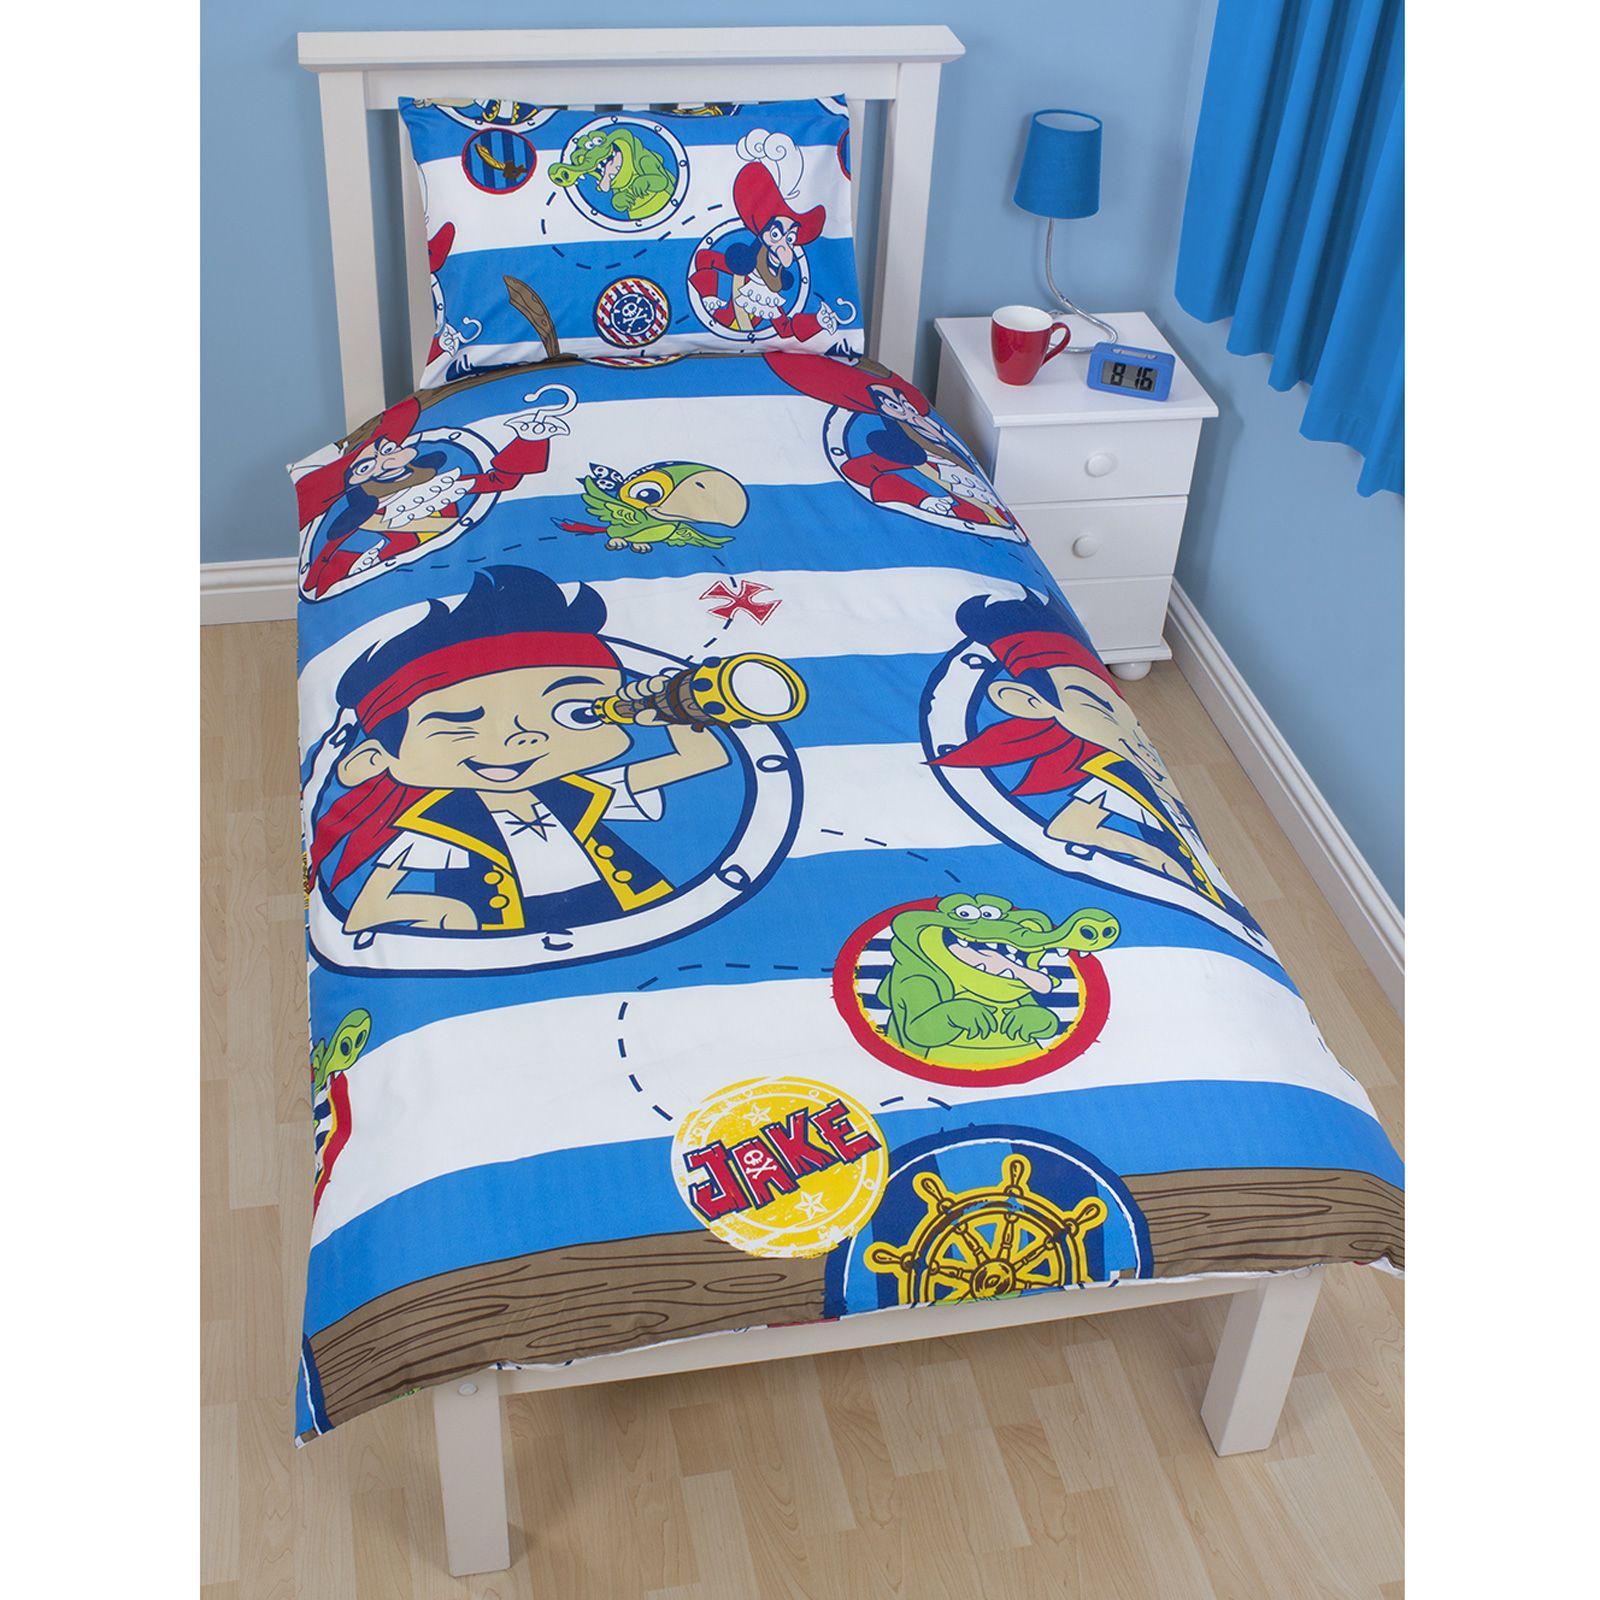 KIDS-CHARACTER-DUVET-COVER-SETS-OFFICIAL-BEDDING-FROZEN-AVENGERS-SOFIA-MORE